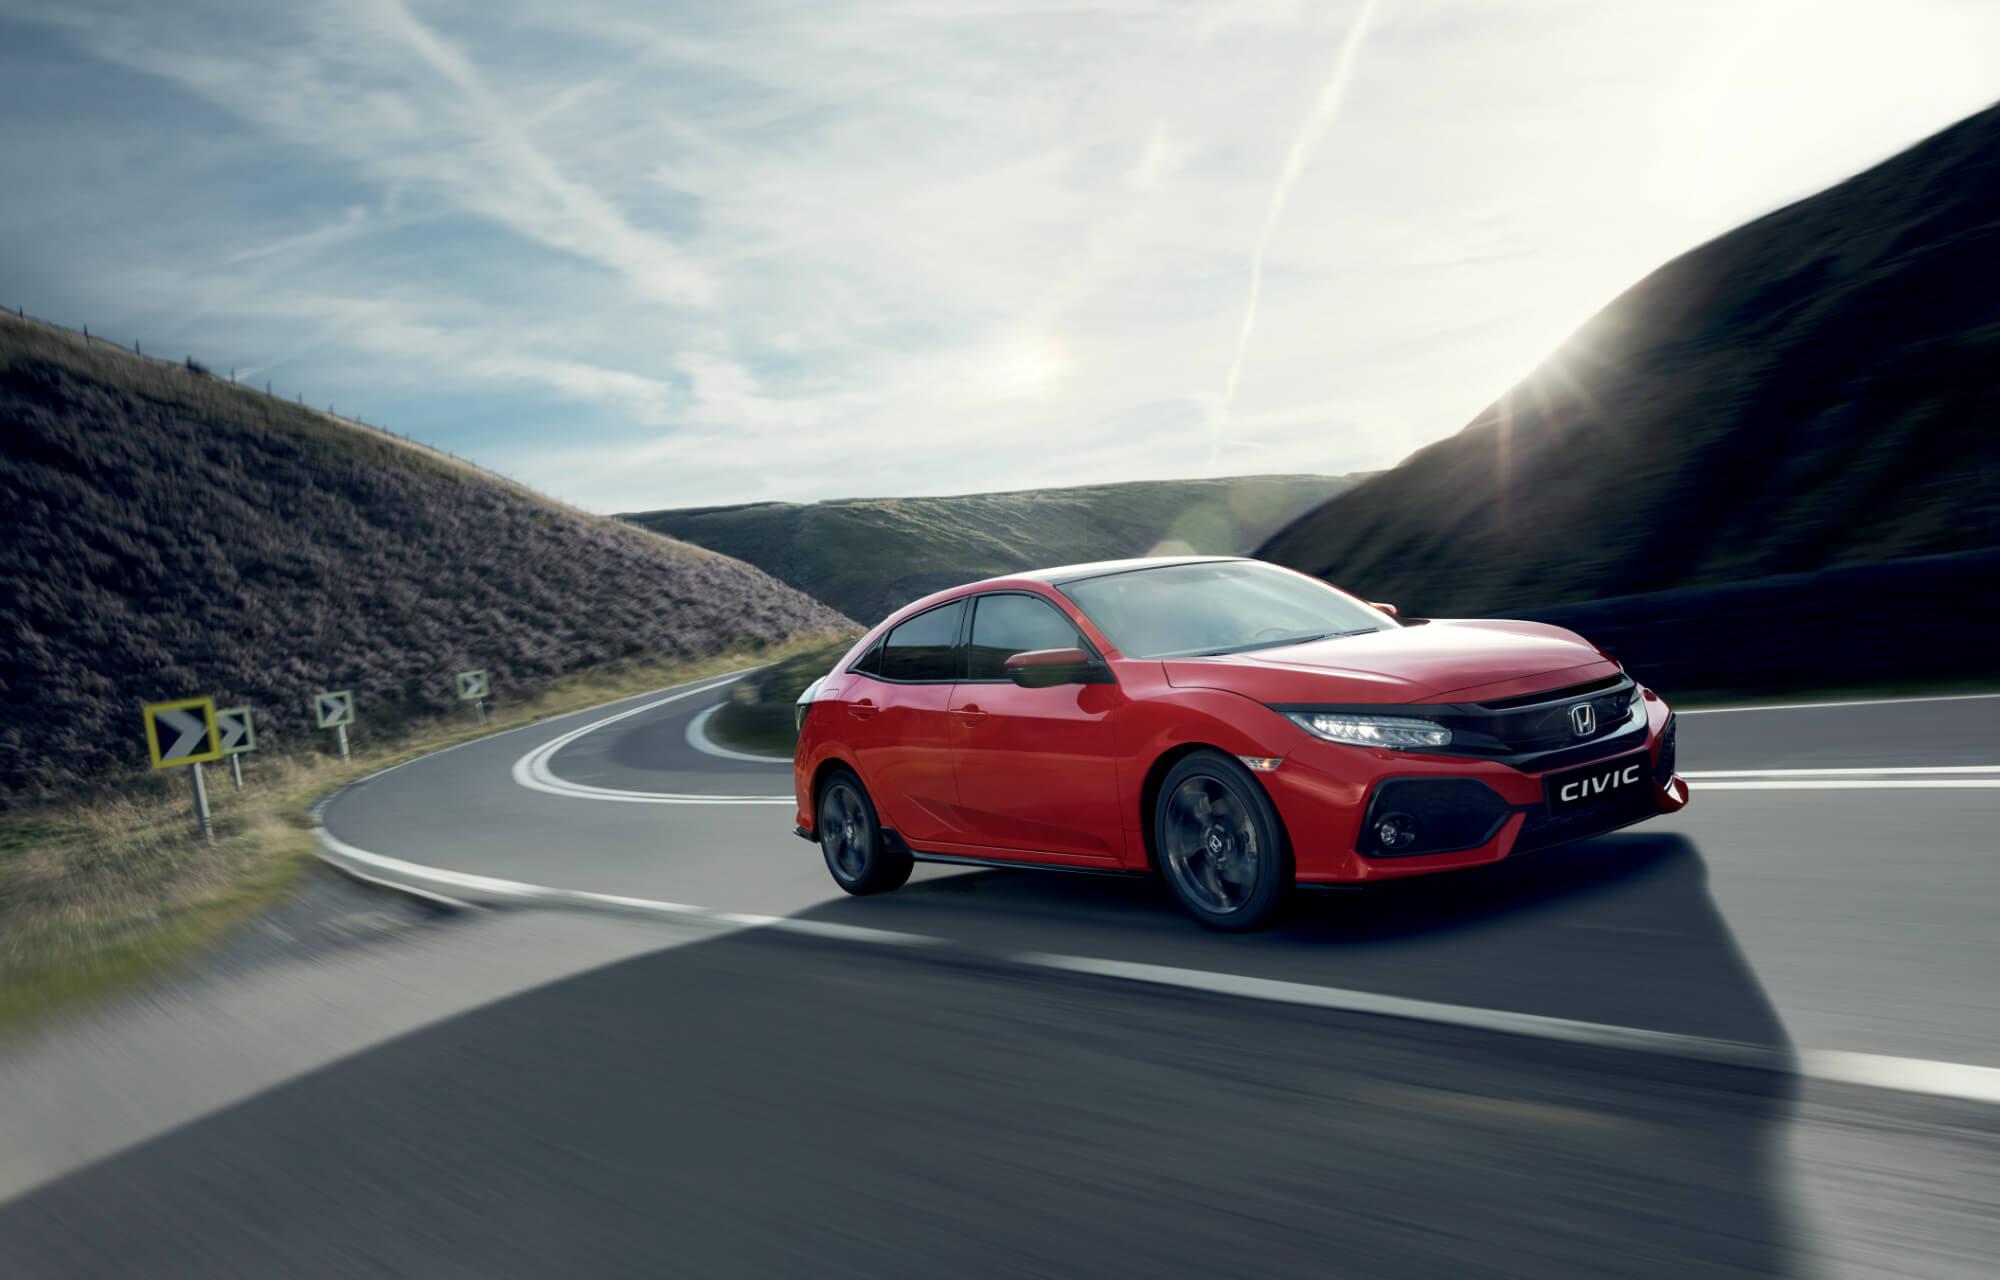 Order your new 2020 Honda Civic 5DR Hatchback today